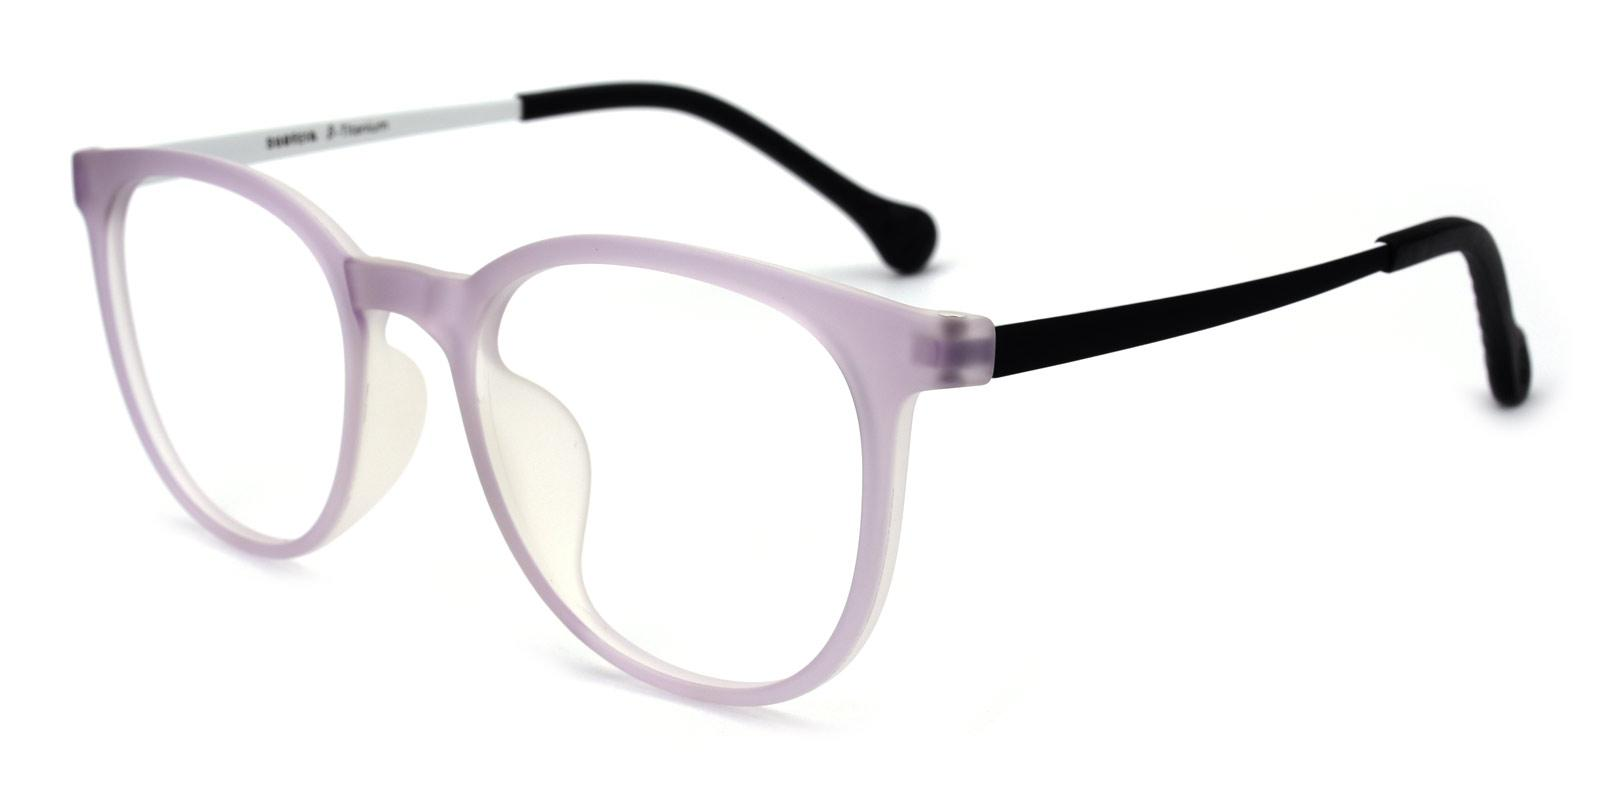 Aaron-Purple-Round-Combination-Eyeglasses-detail